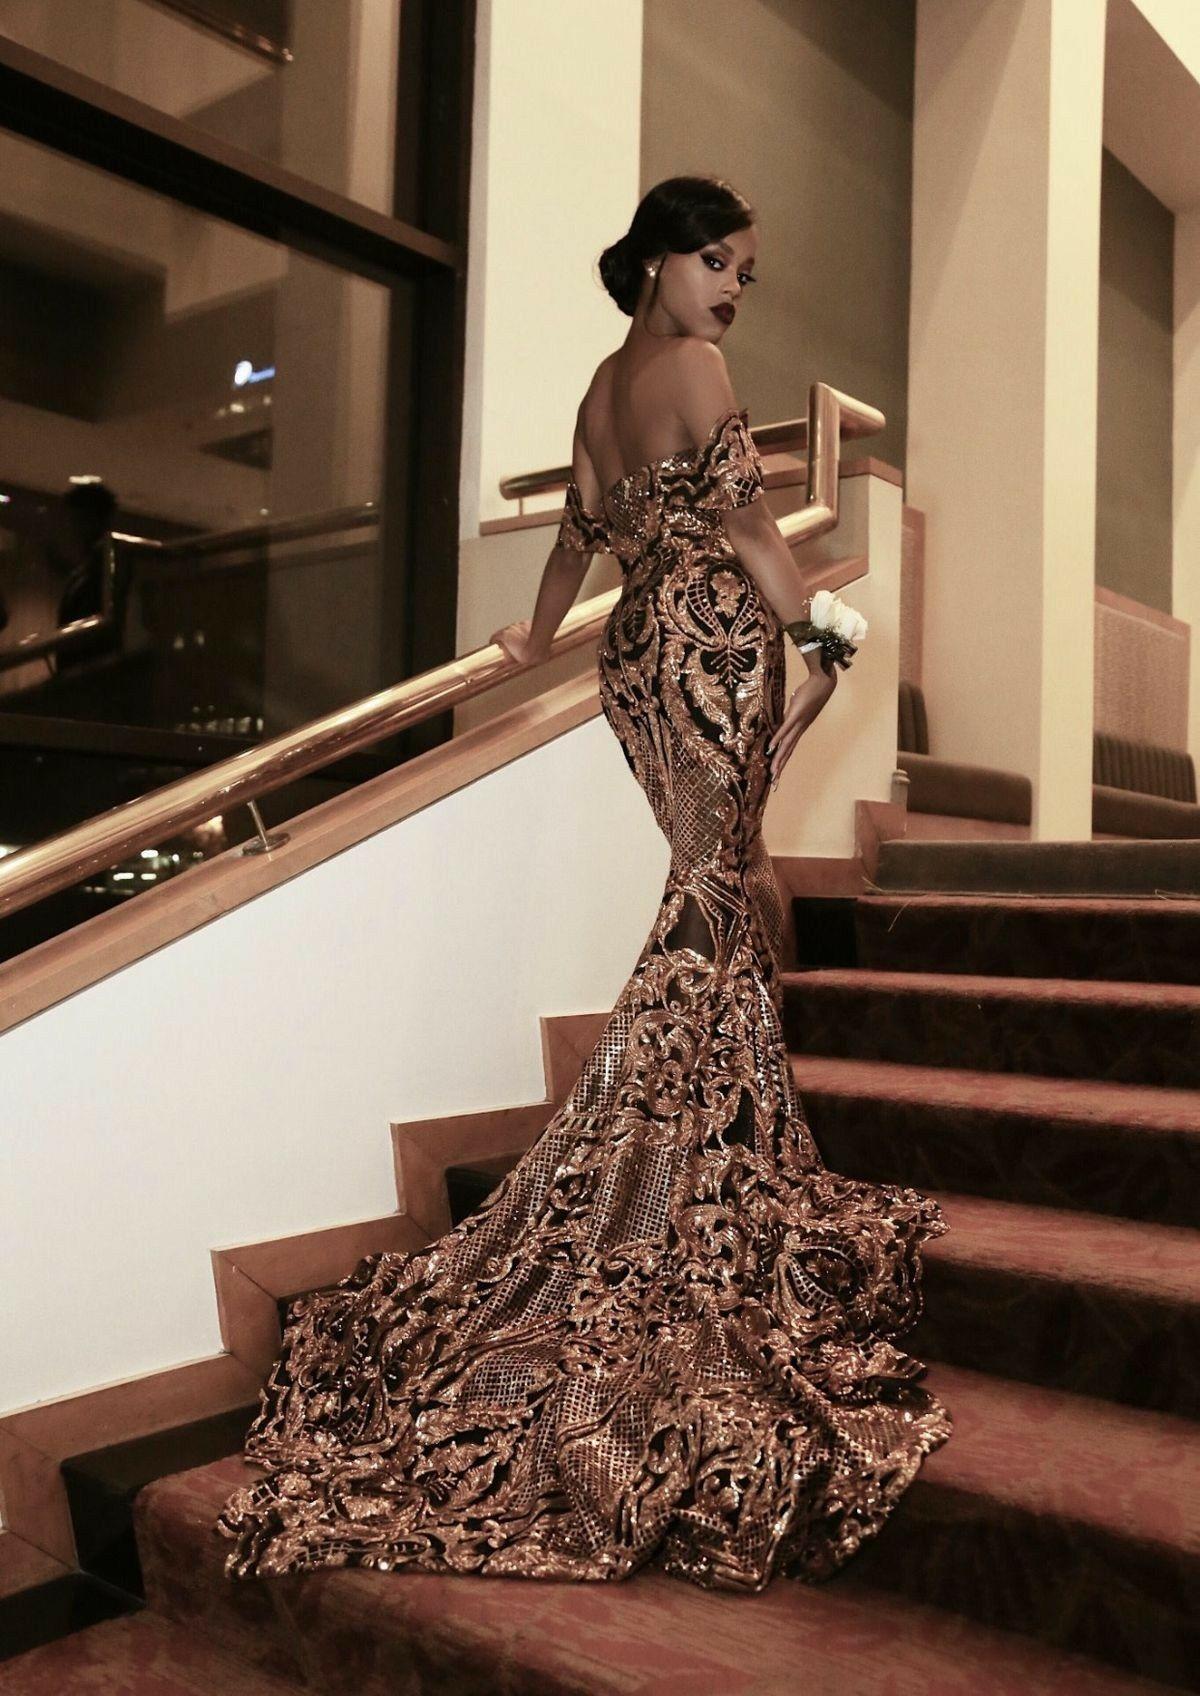 Pin by amaya williams on senior prom in pinterest